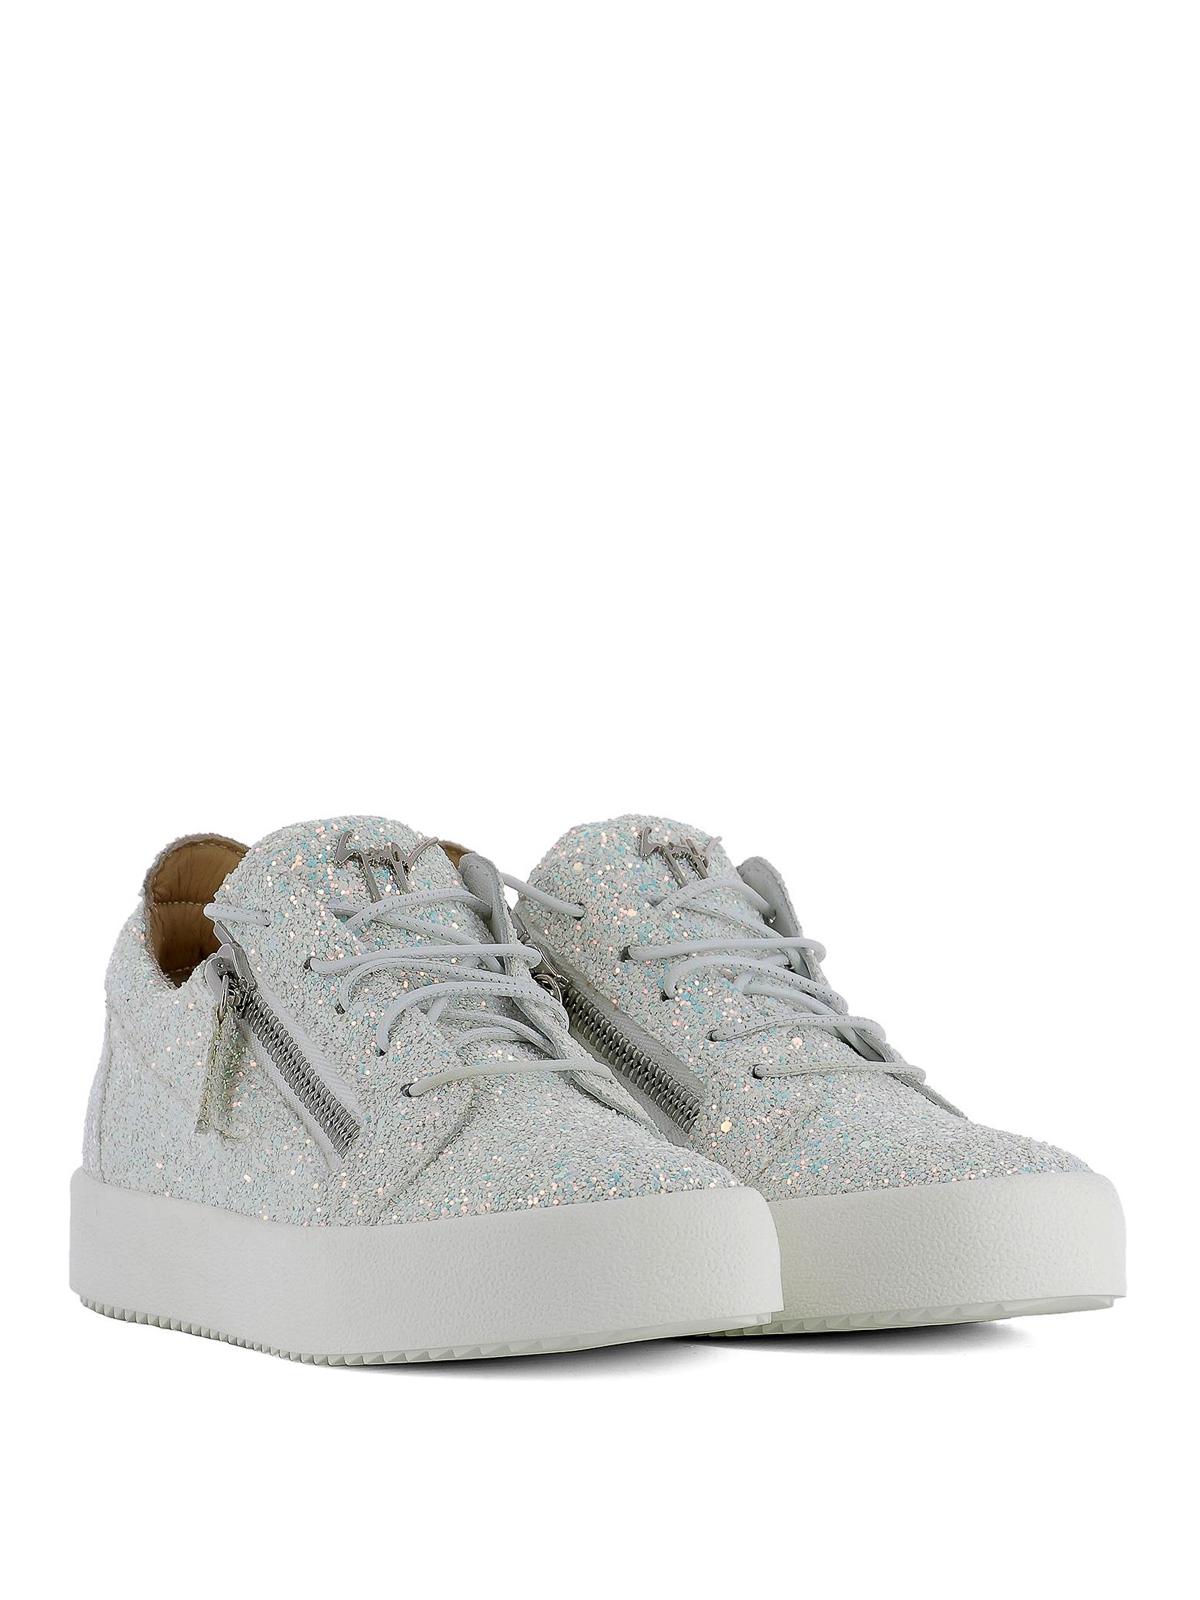 abf8ee5b1f82f GIUSEPPE ZANOTTI: trainers online - Cheryl Glitter fabric sneakers